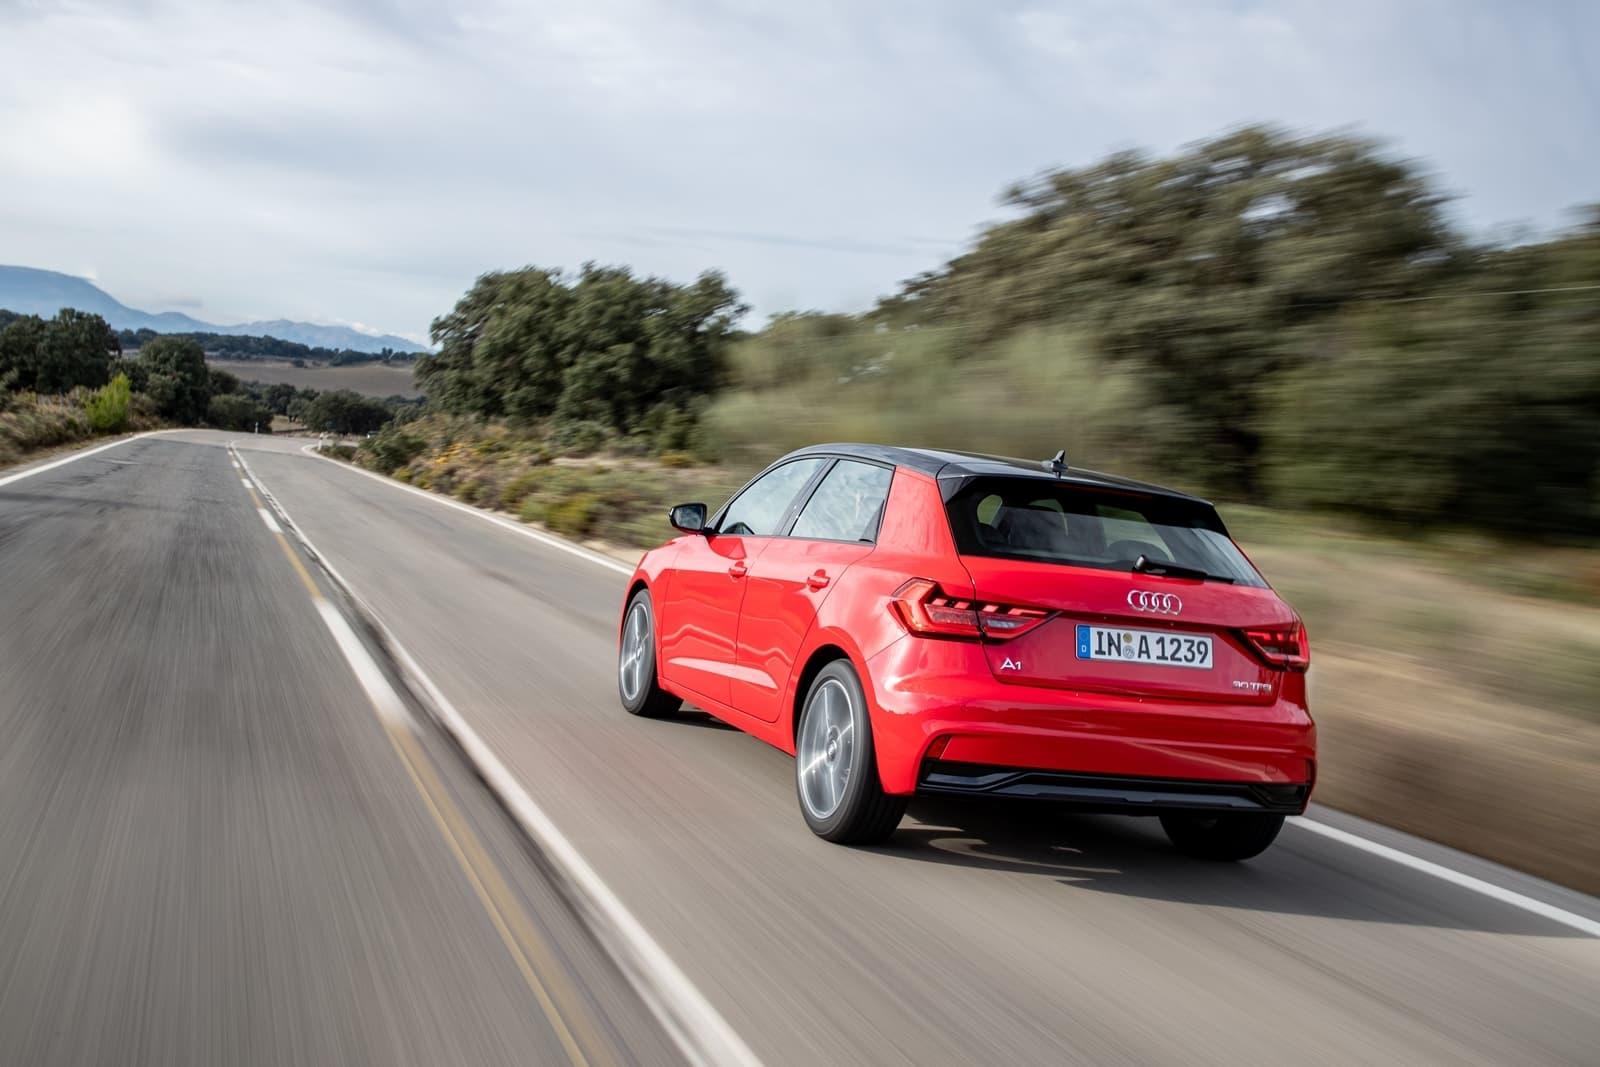 Audi A1 2019 1118 045